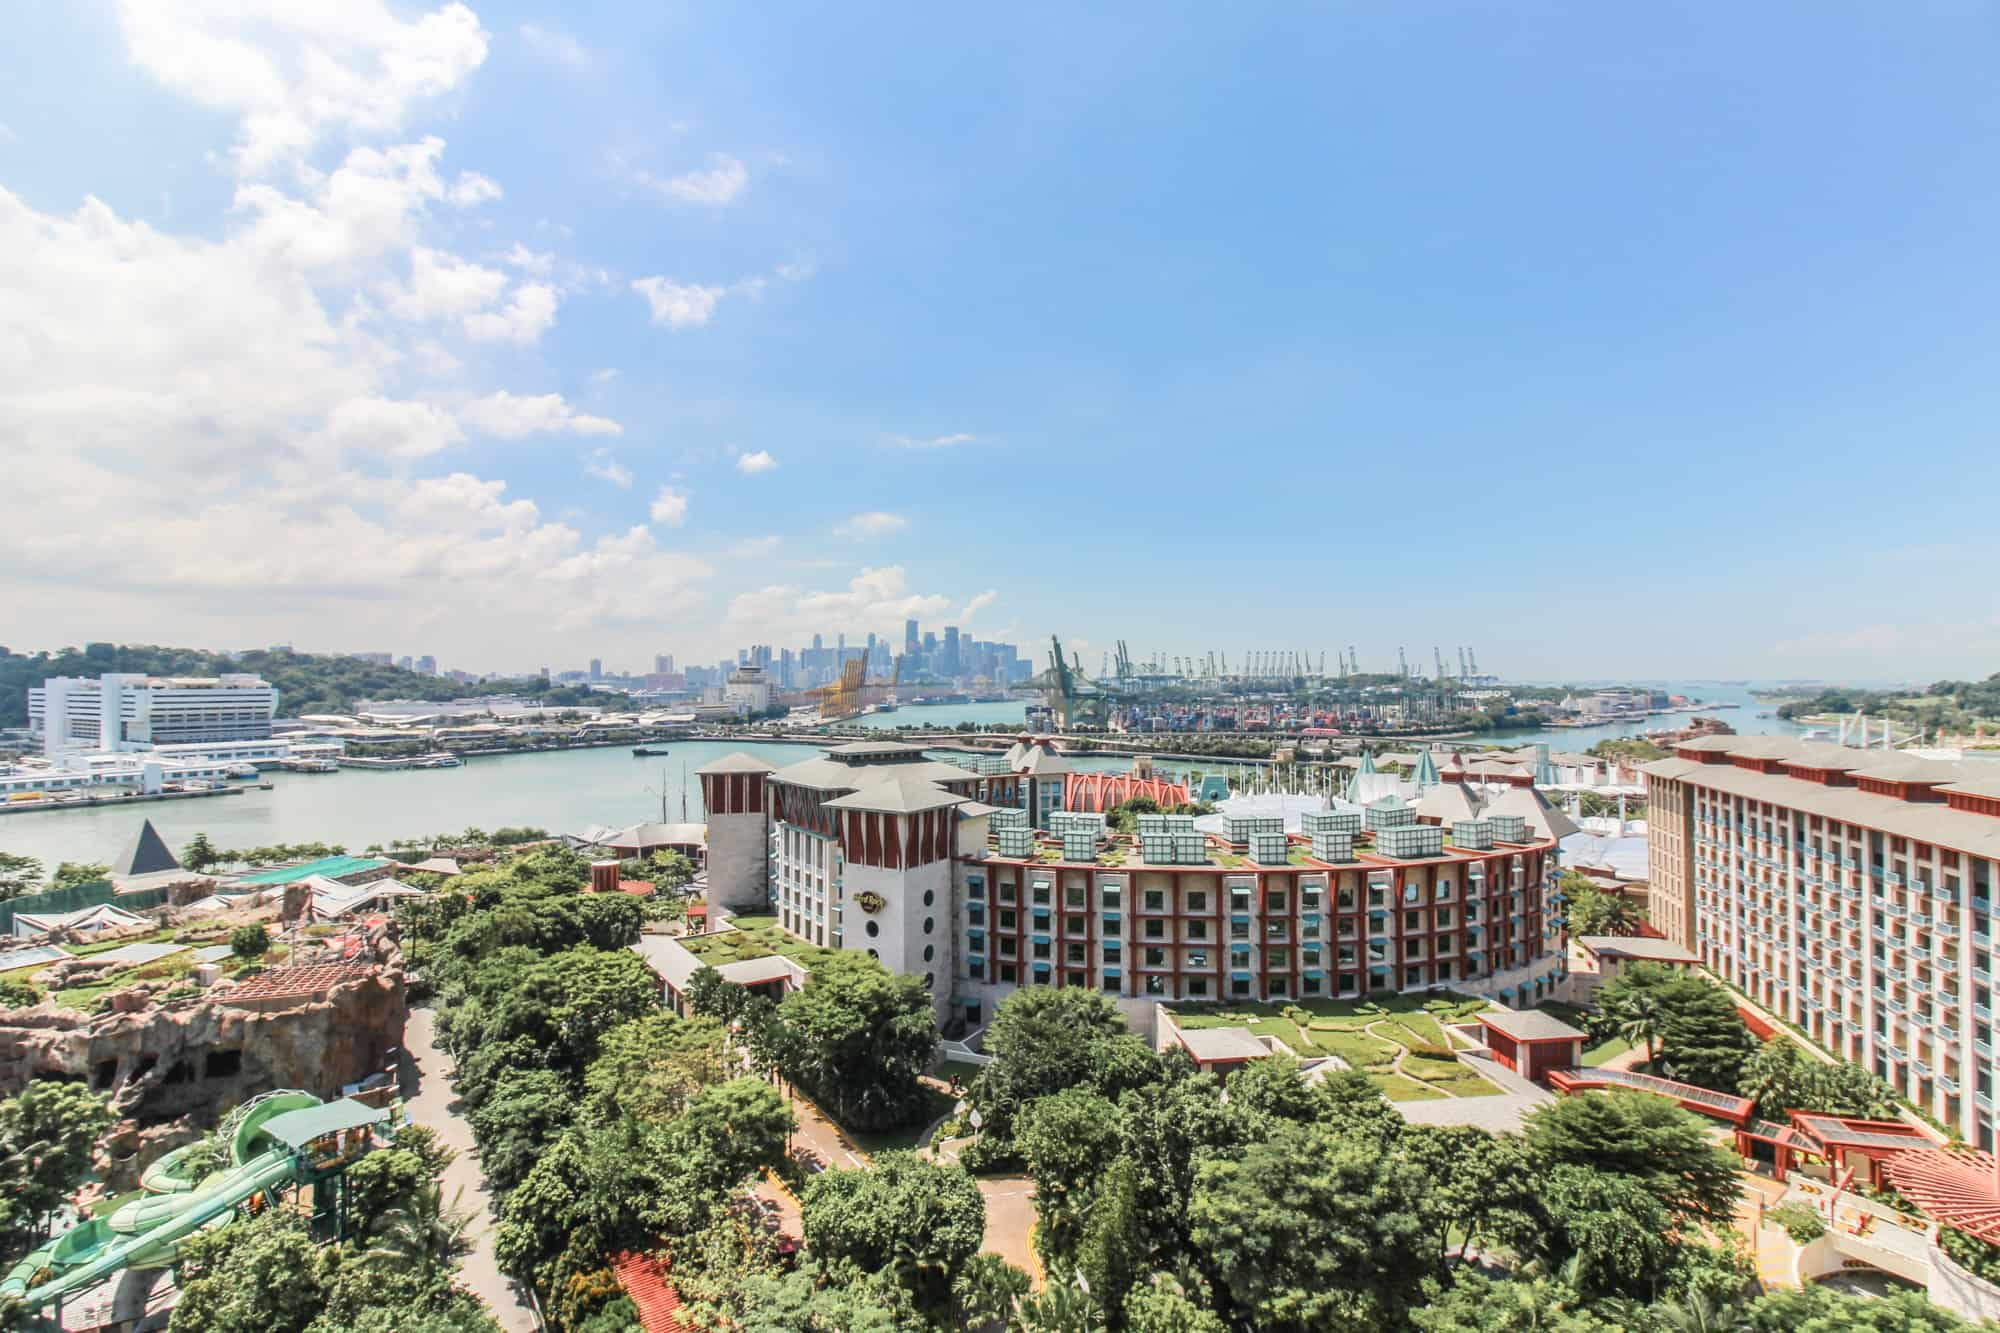 Photo Spots in Singapore: Sentosa